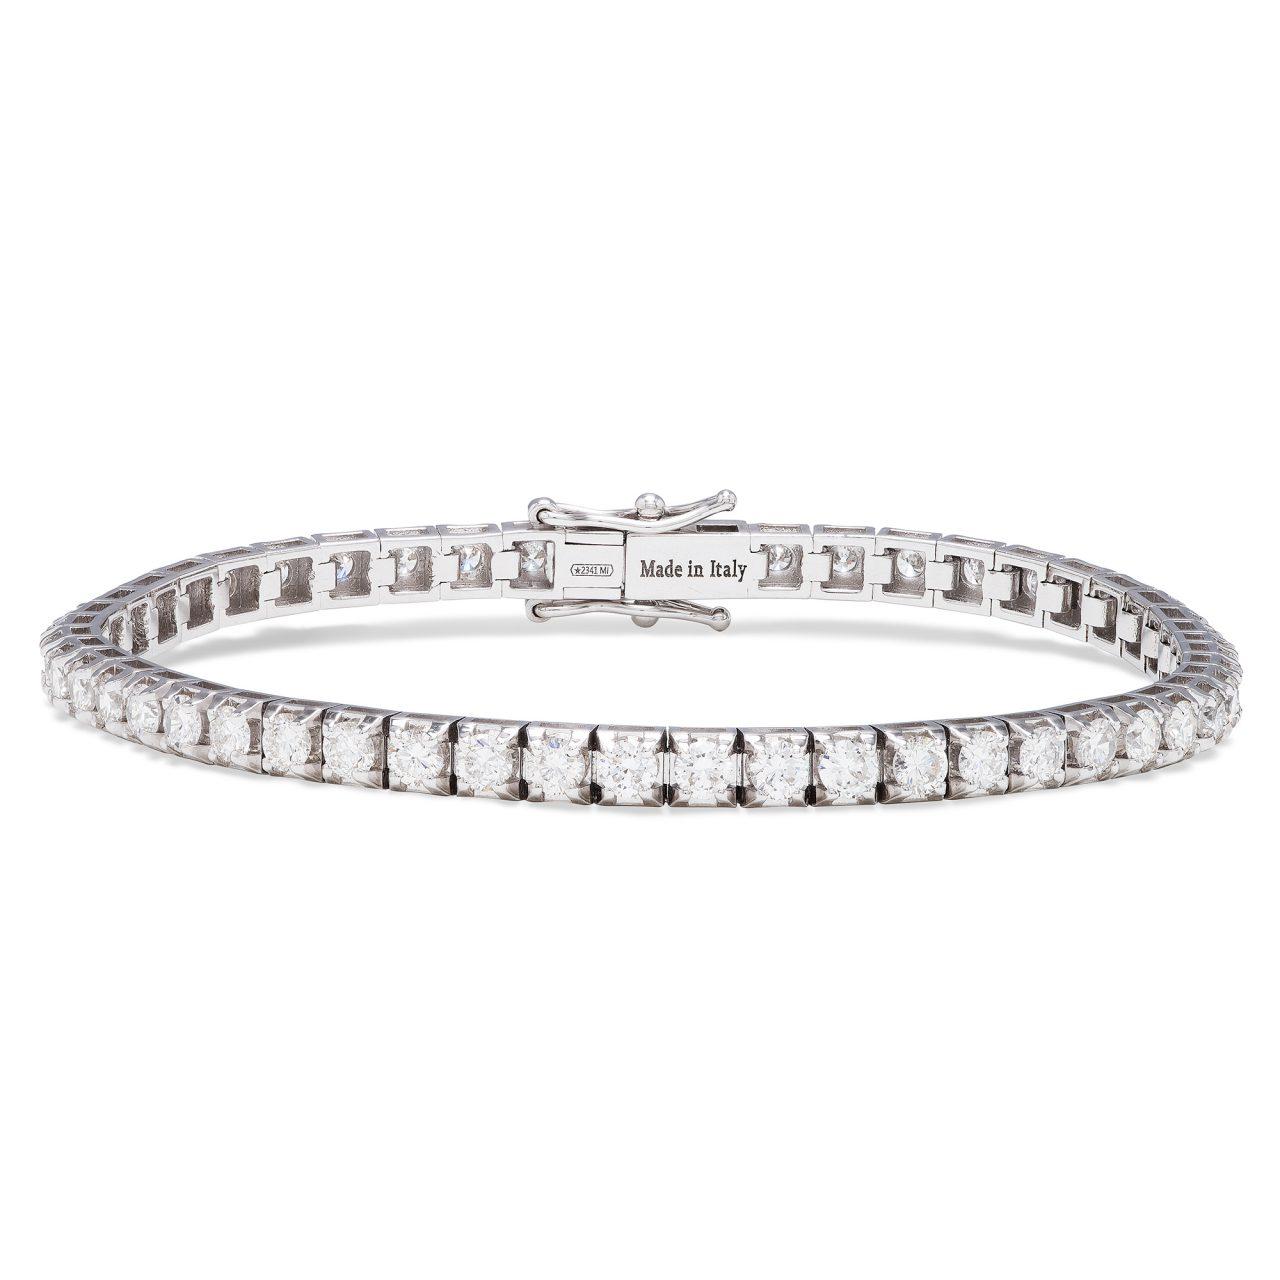 18k white gold tennis bracelet with 4,59 ct diamonds